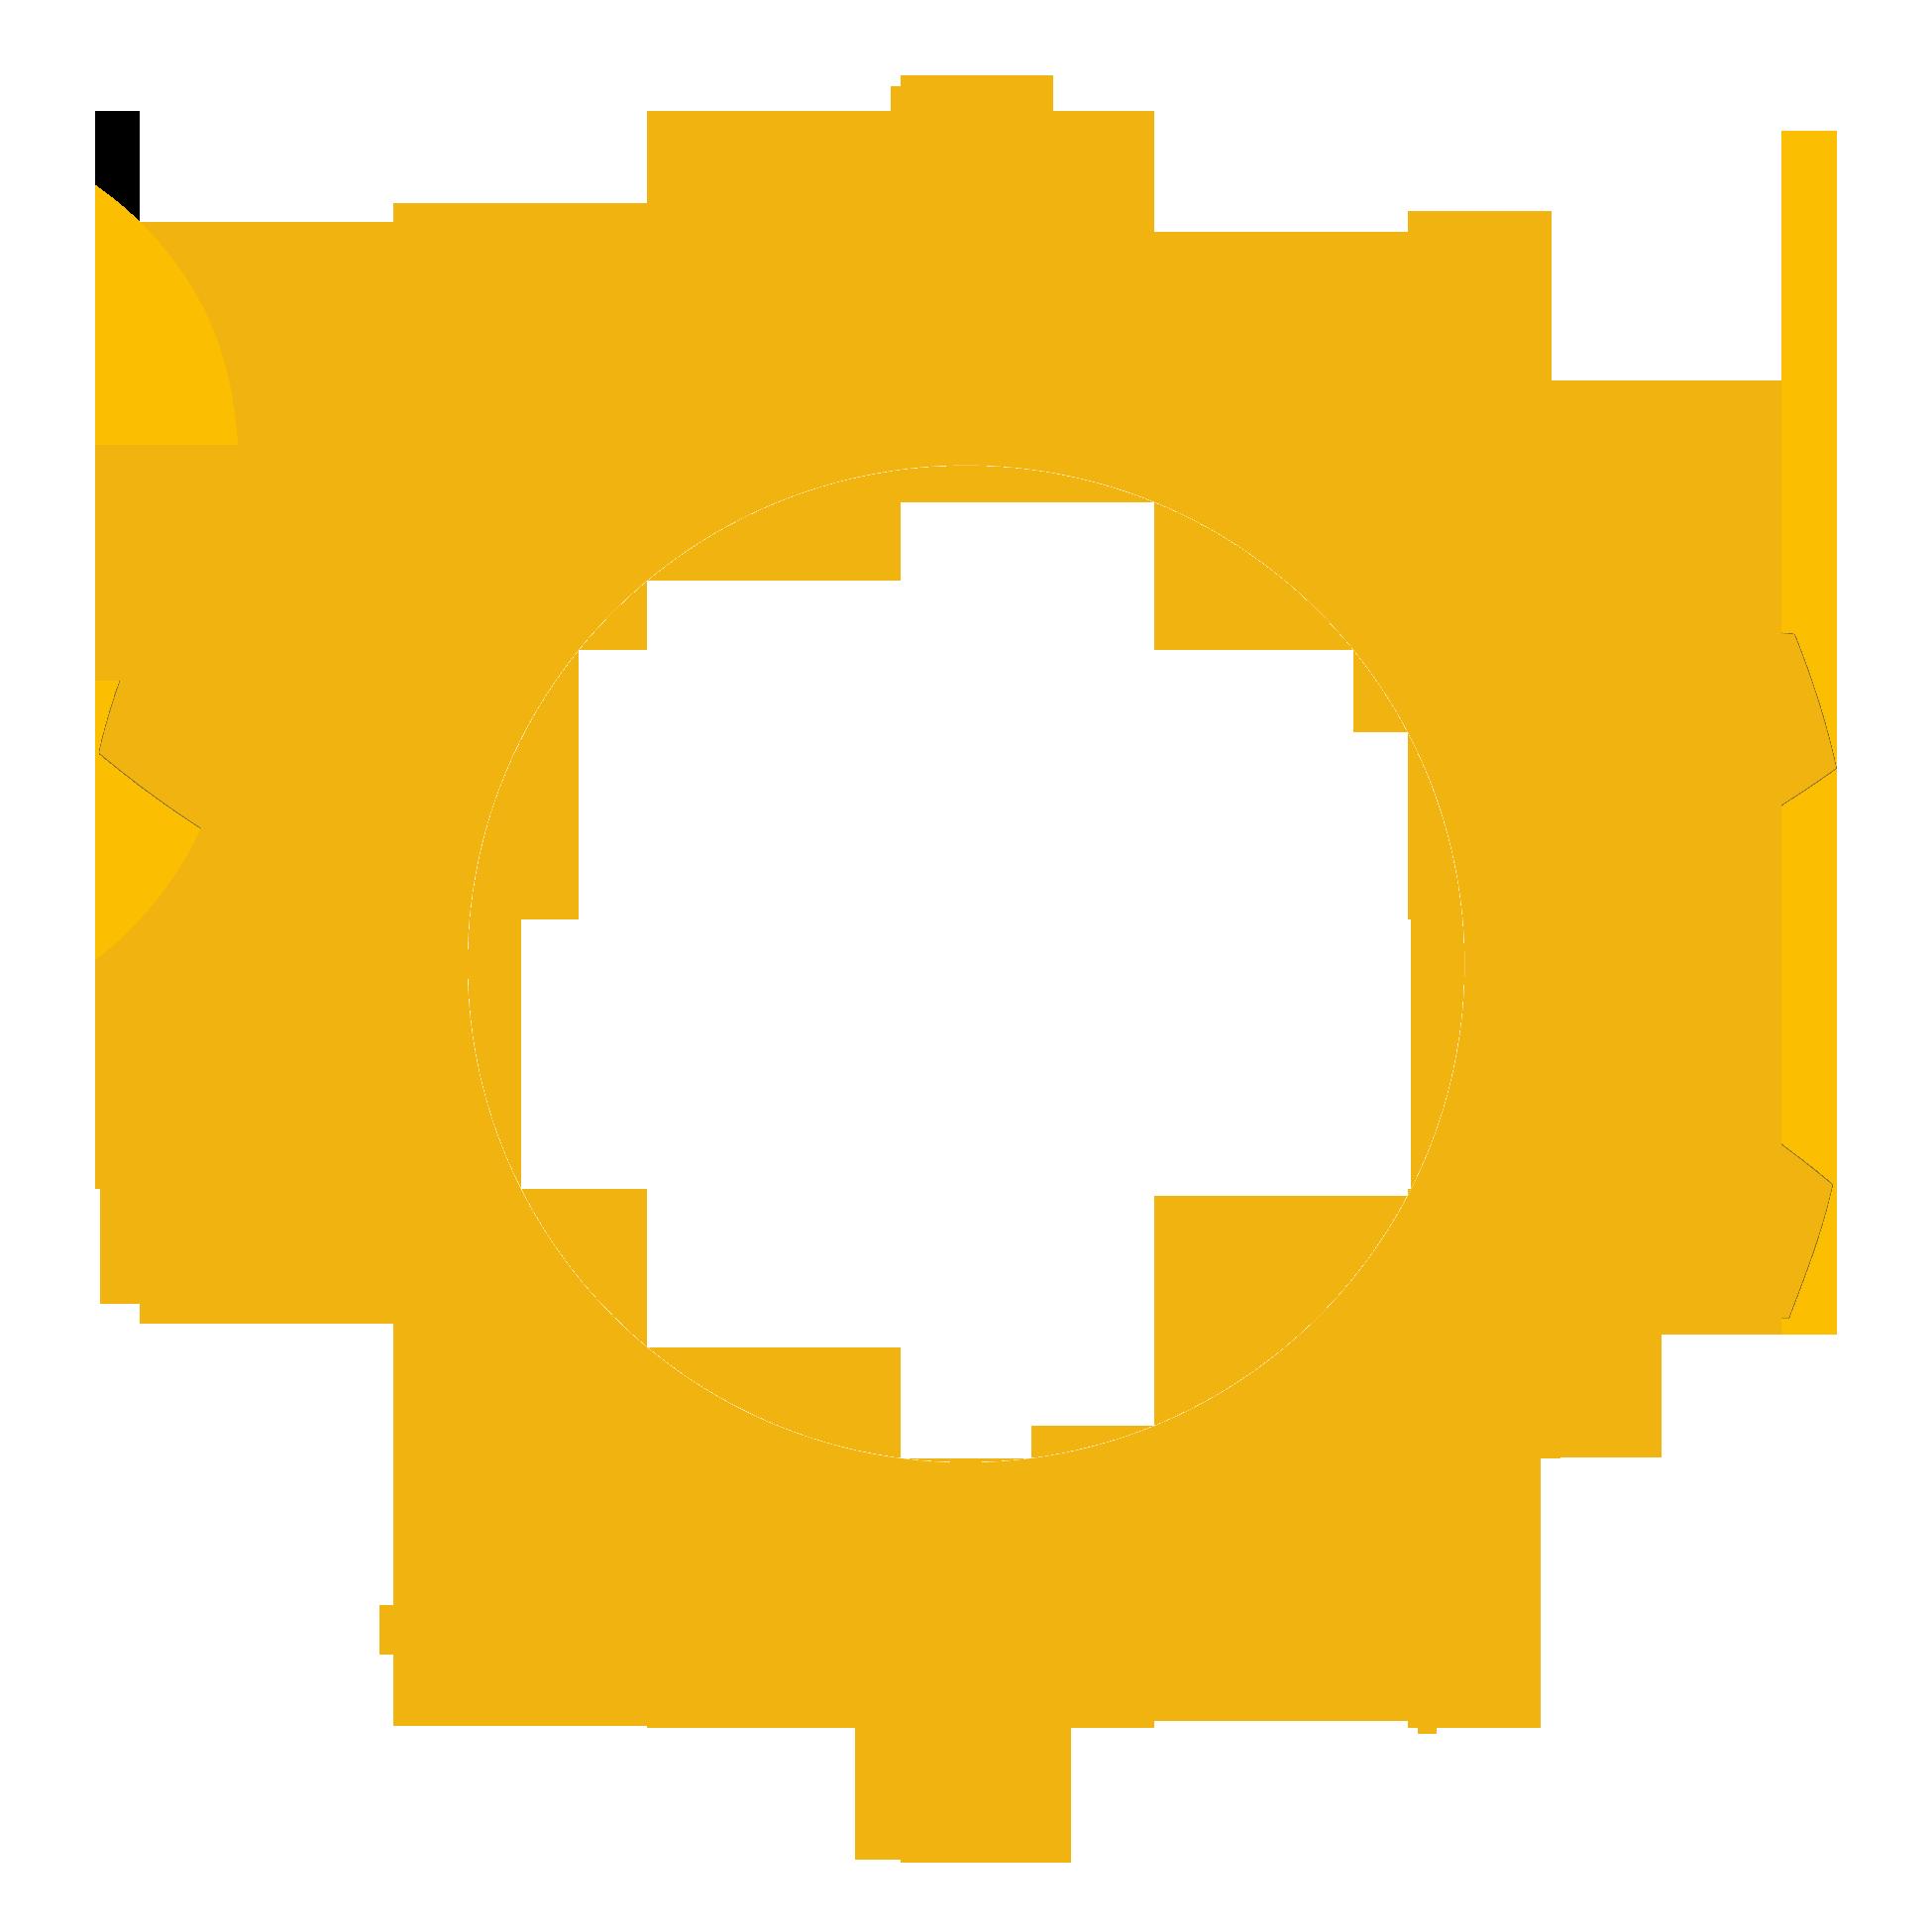 Logicopy Gear